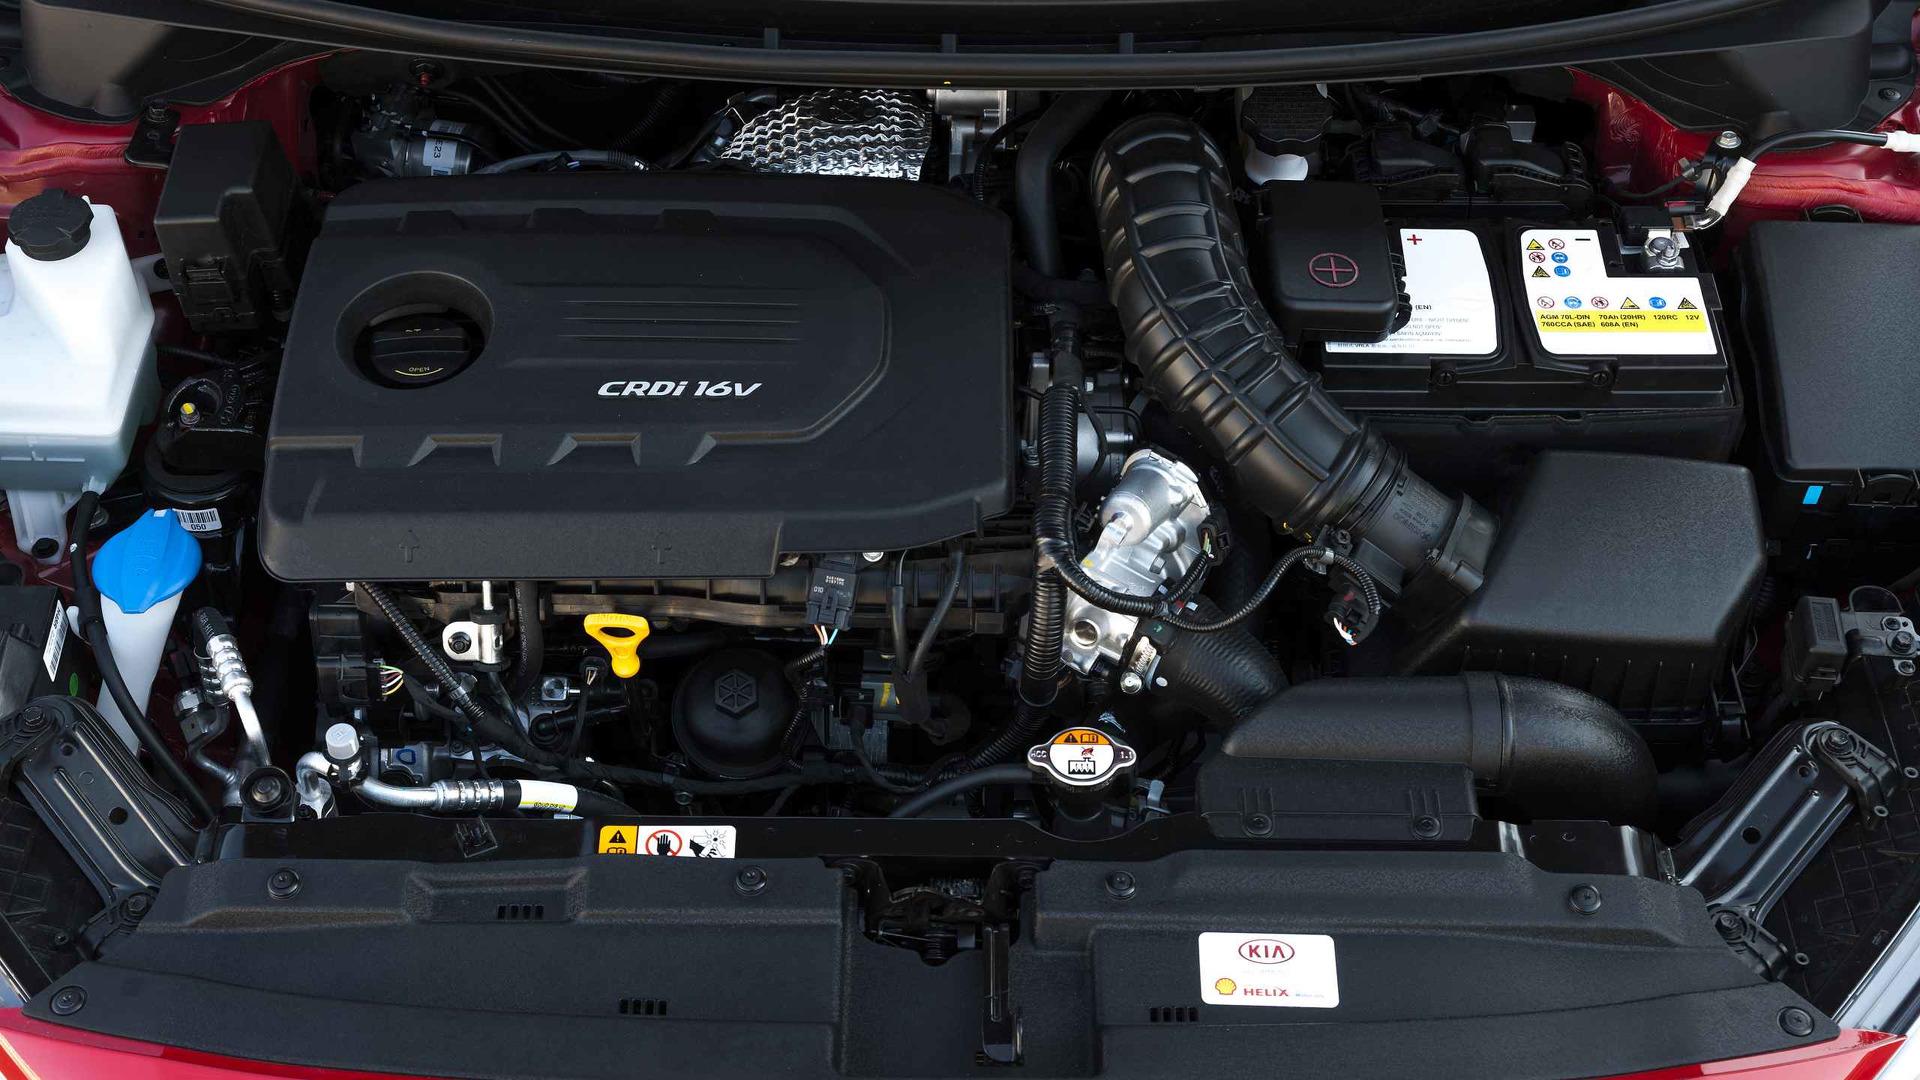 Kia Ceed Engine >> 2017 Kia Ceed Review